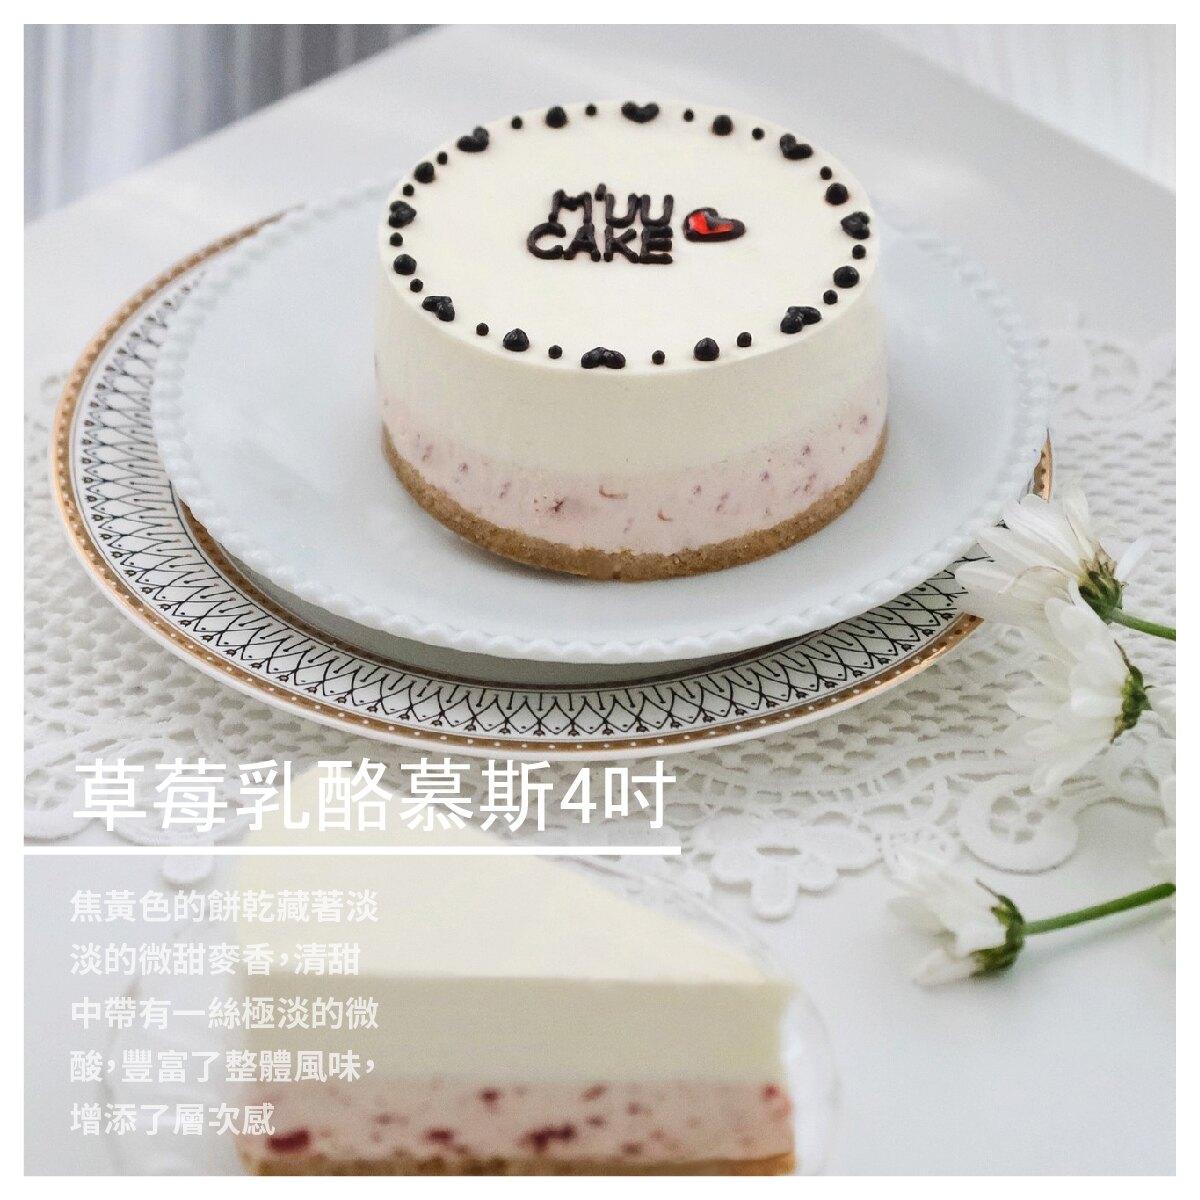 【 M'uu Cake霂克】草莓乳酪慕斯 4吋